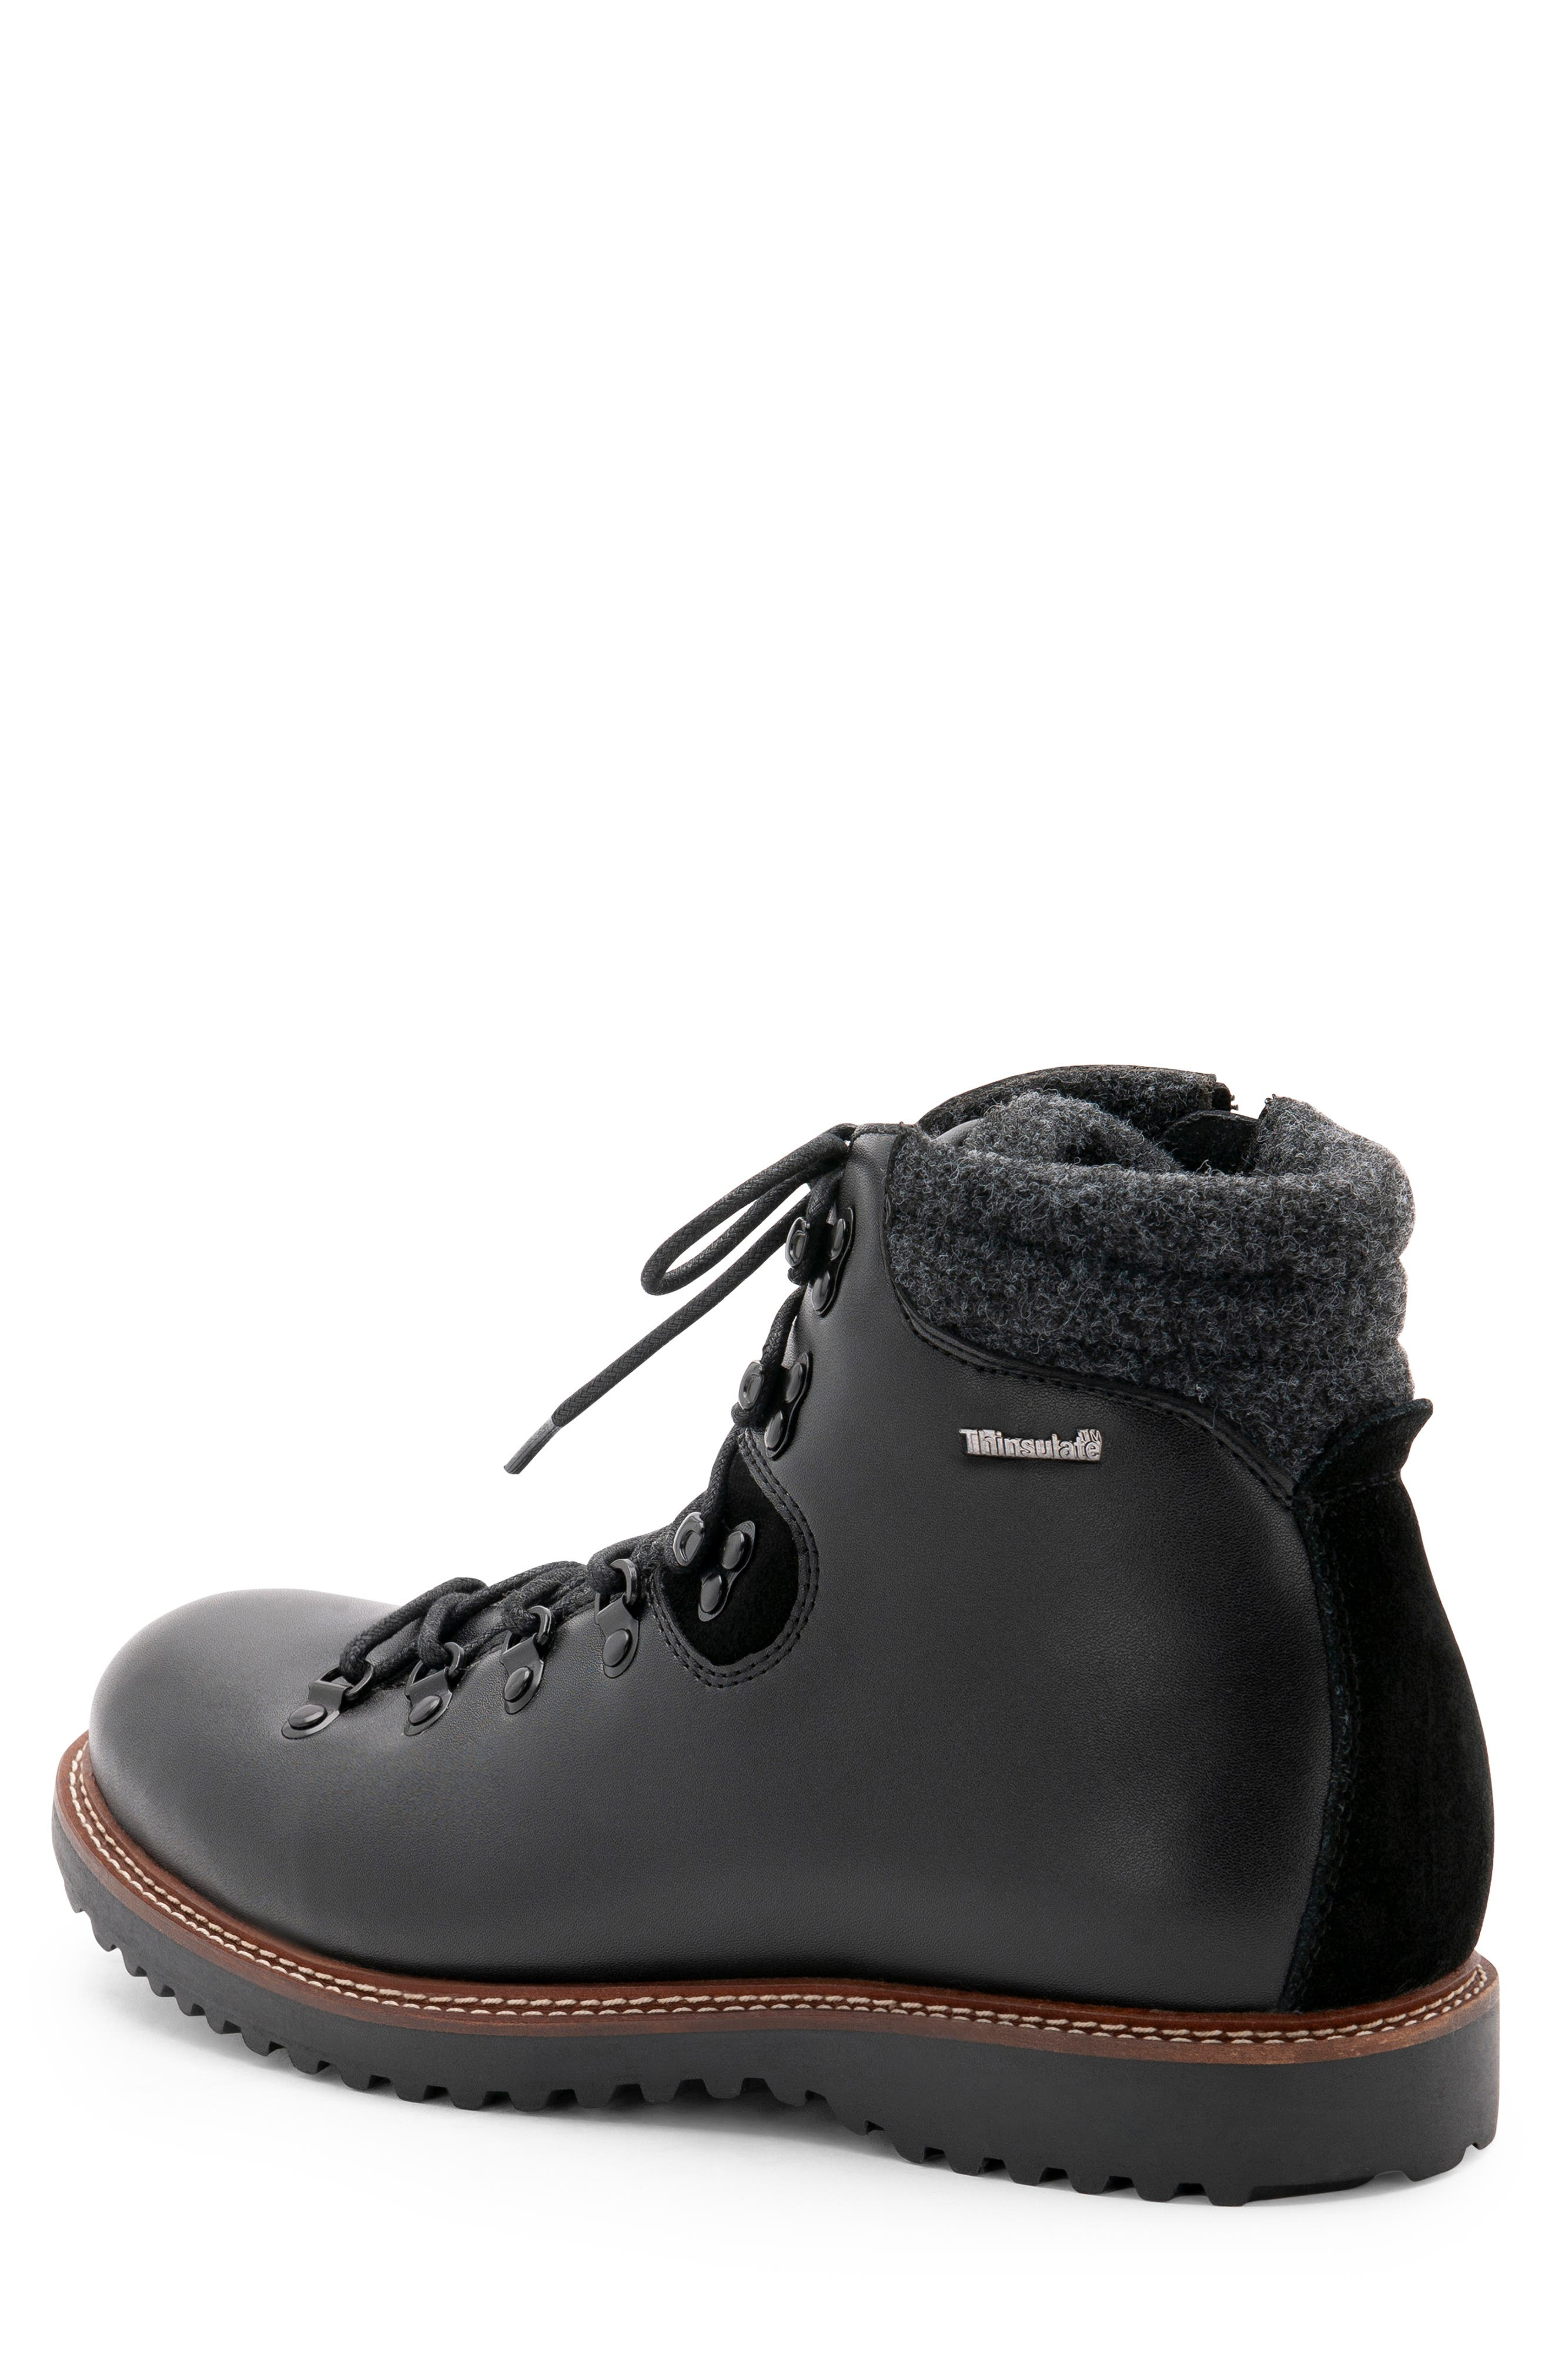 Morgan Waterproof Plain Toe Boot,                             Alternate thumbnail 2, color,                             BLACK LEATHER